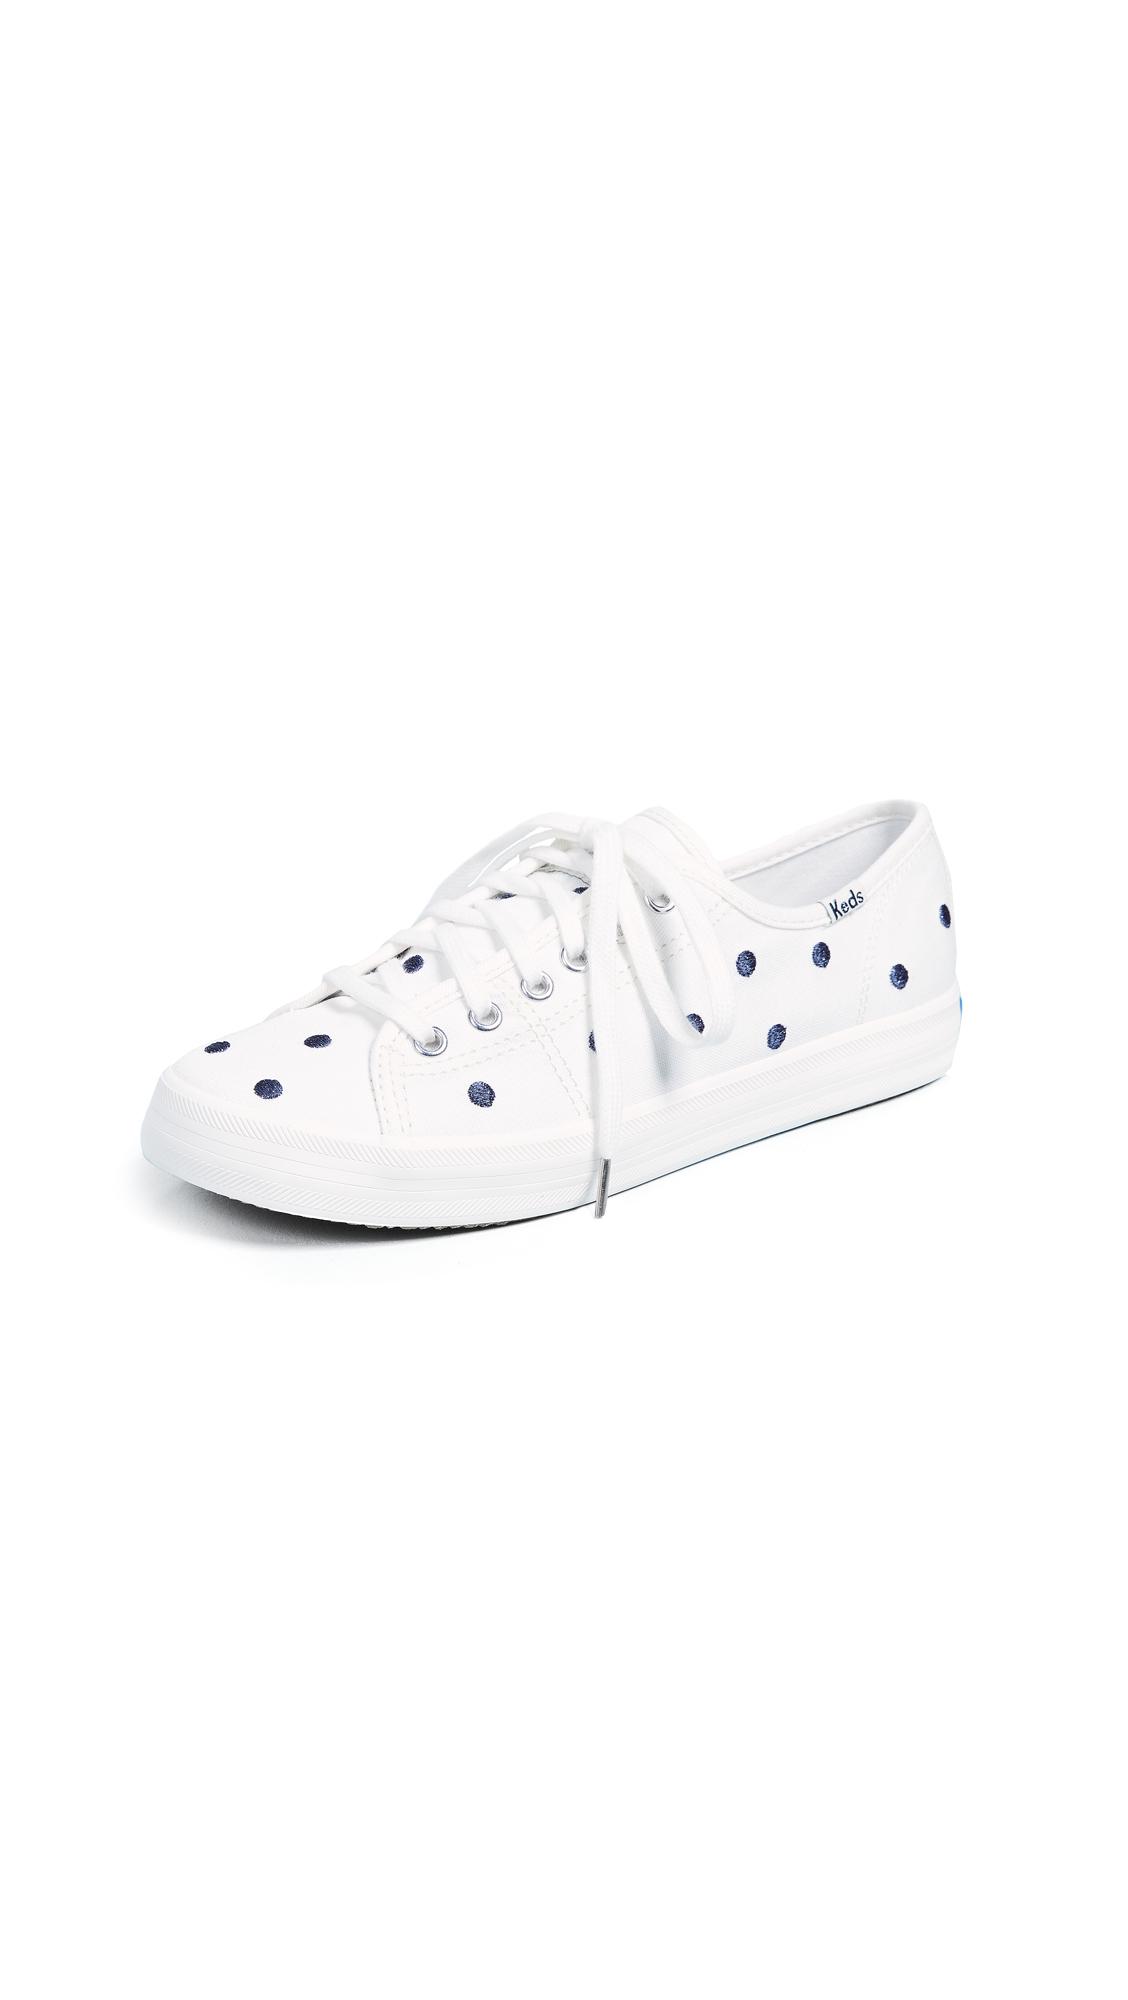 Keds x Kate Spade Dancing Dot Sneakers - Cream/Navy